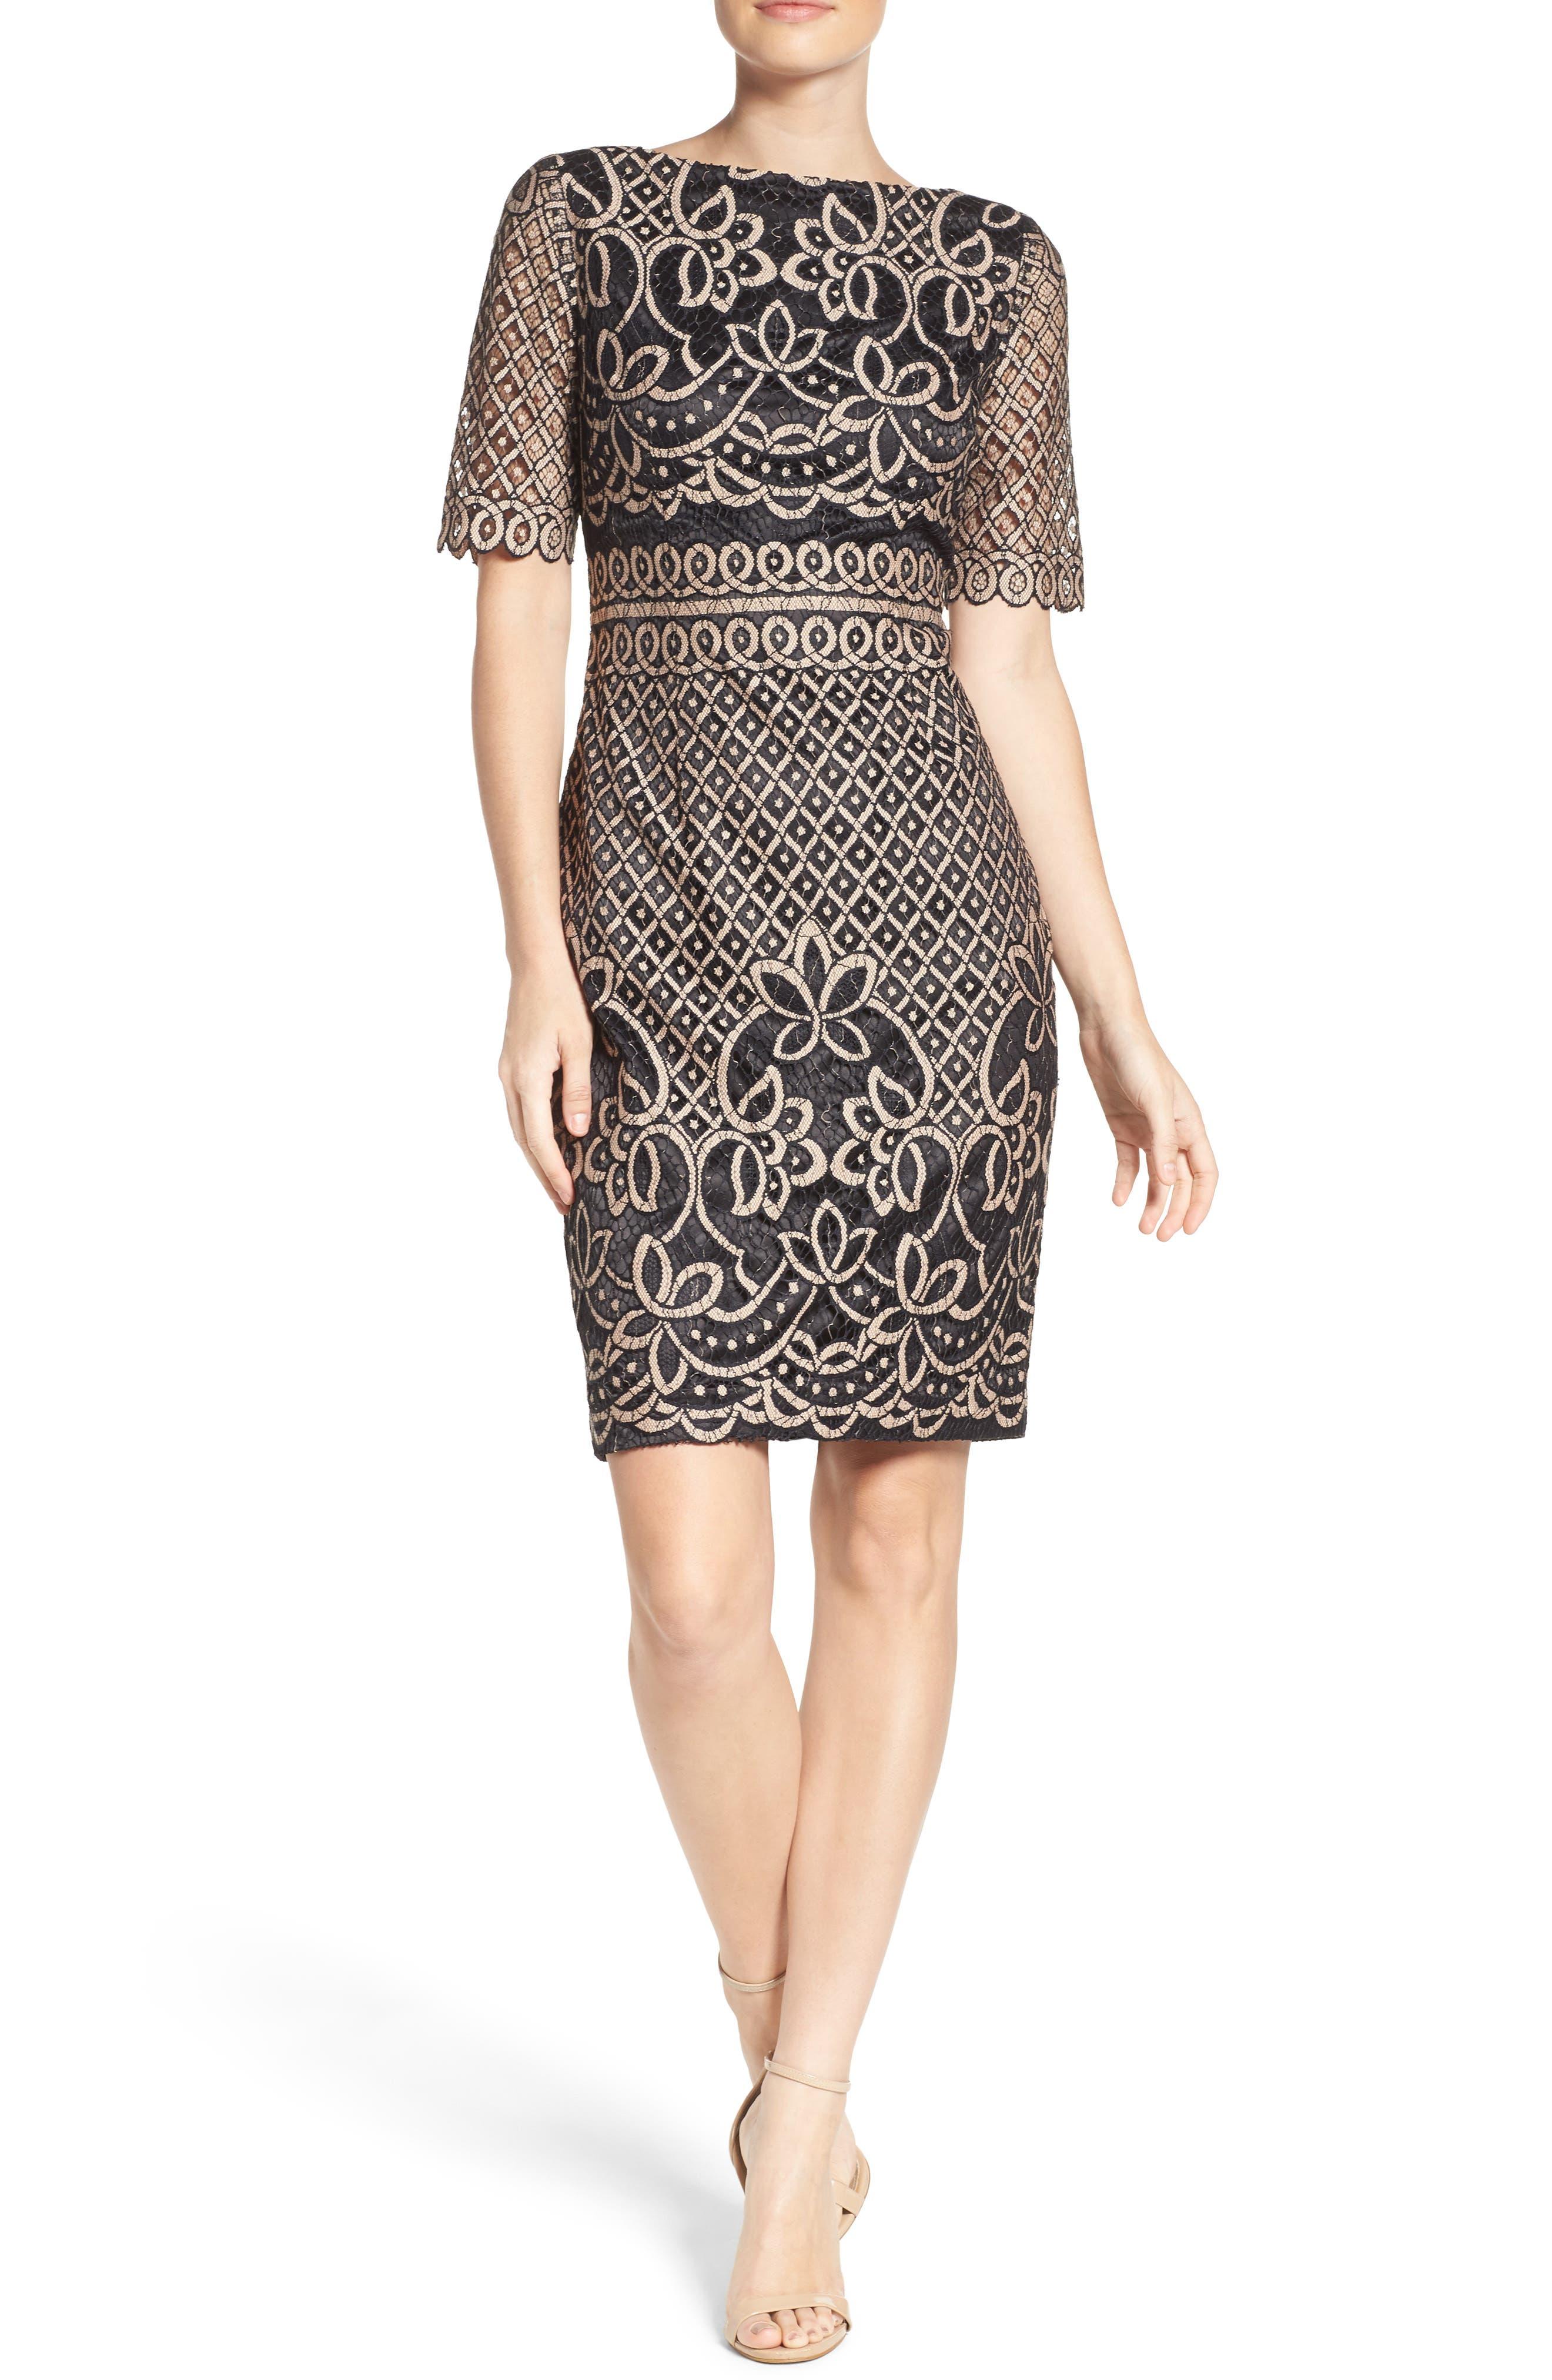 ELIZA J, Lace Sheath Dress, Alternate thumbnail 6, color, 009